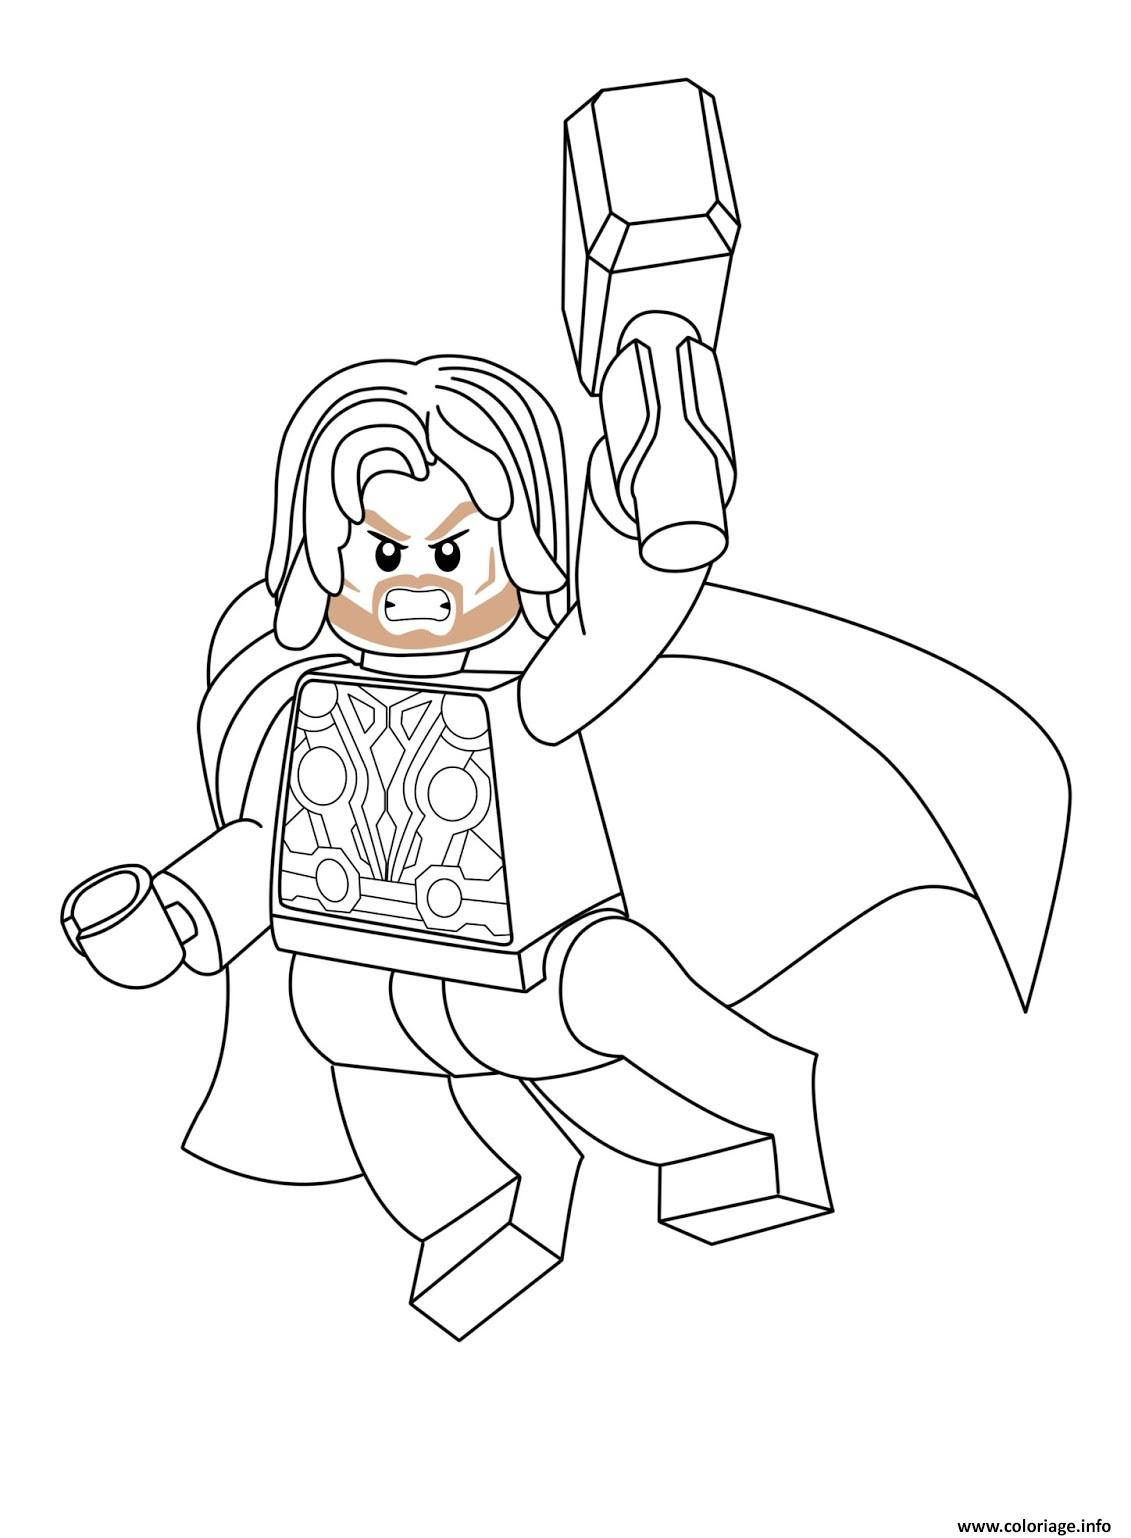 Coloriage lego marvel thor dessin - Lego coloriage ...